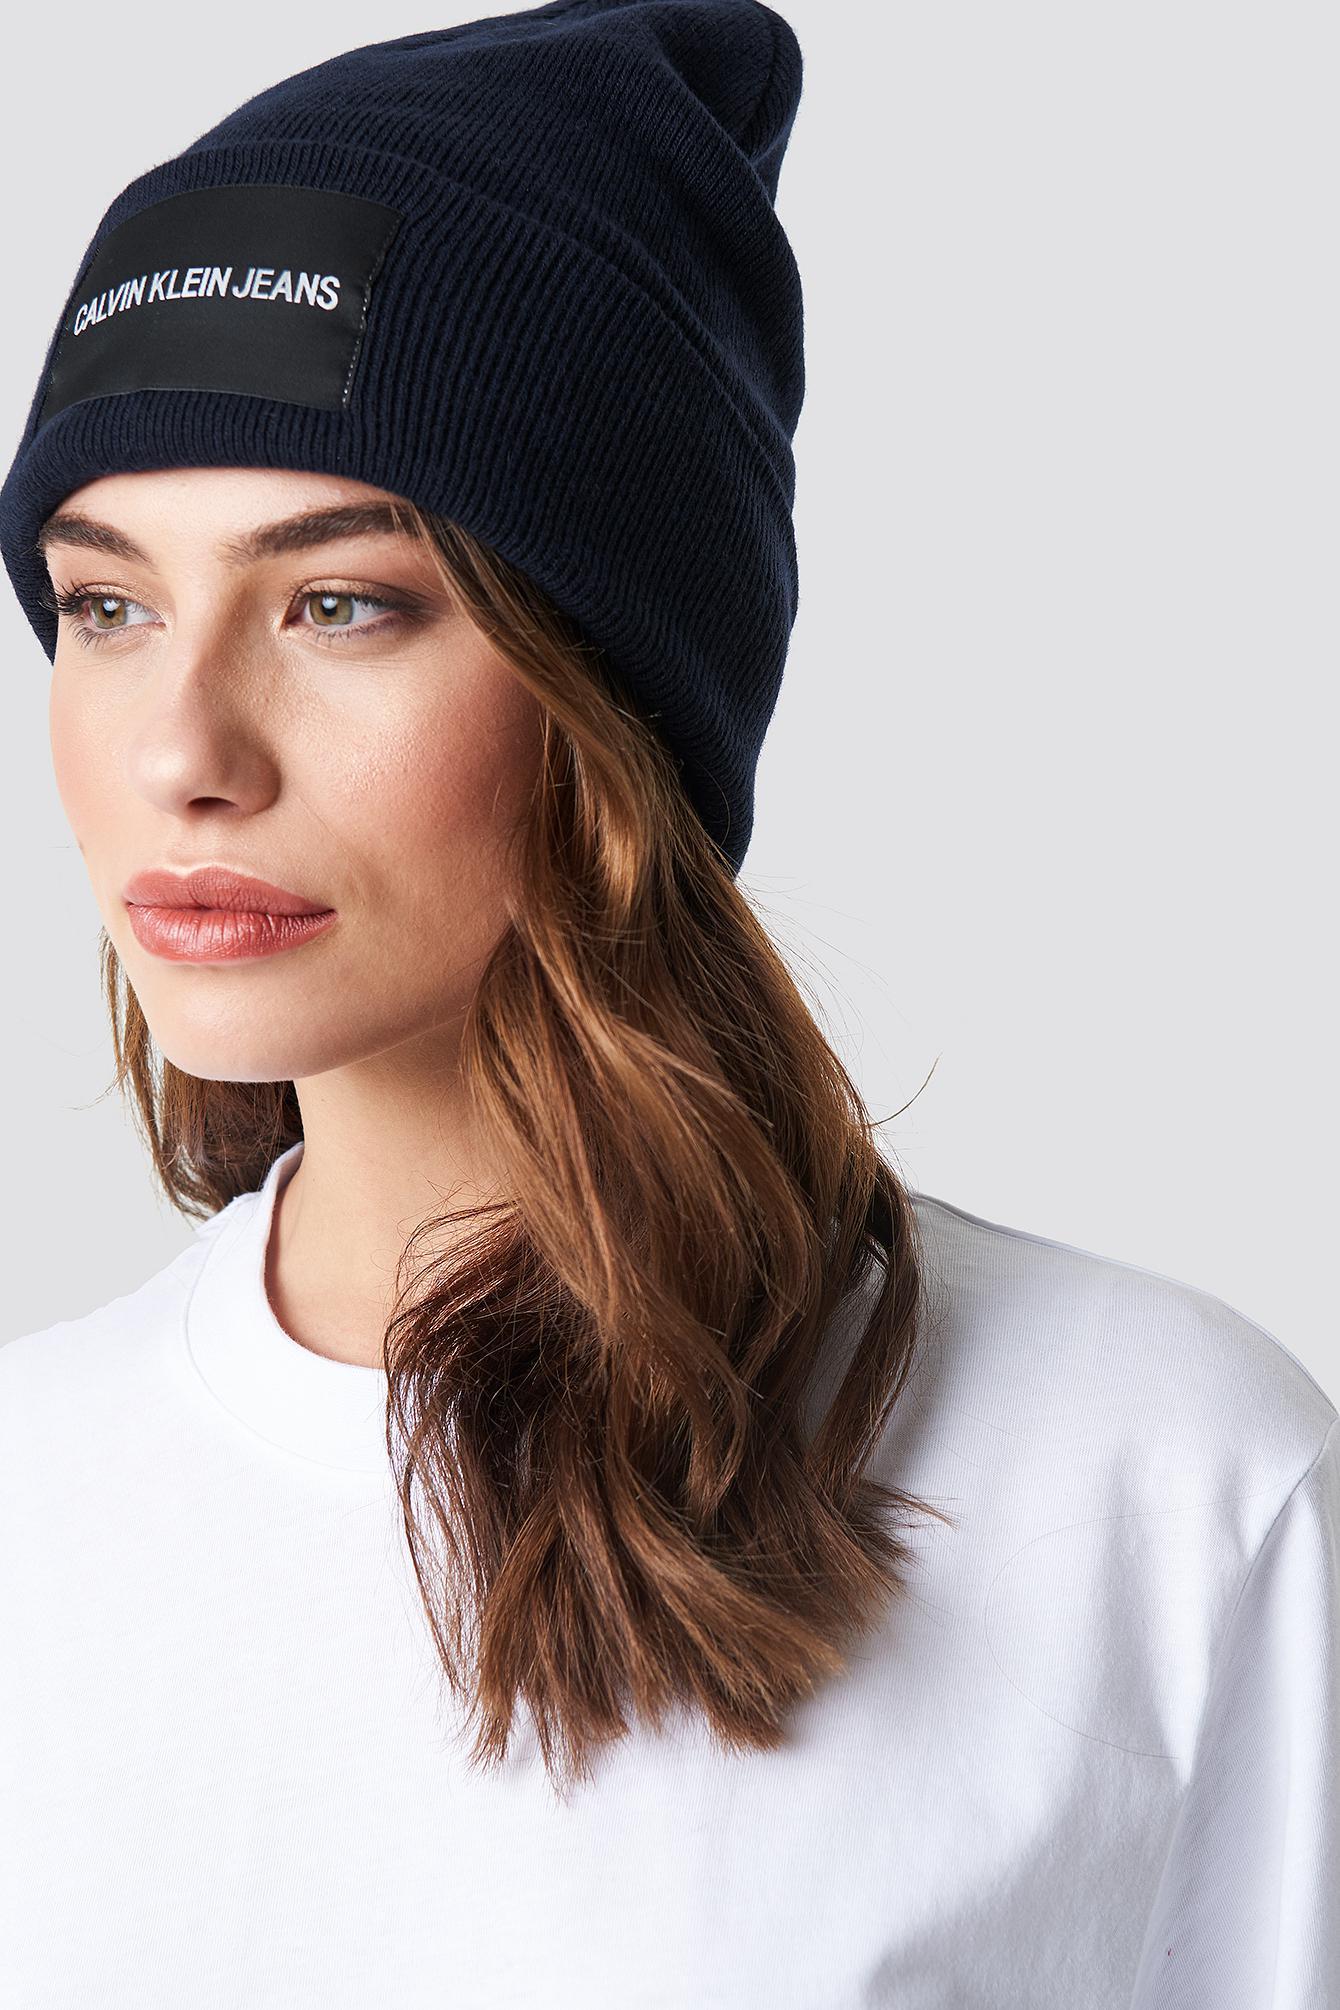 Lyst - Calvin Klein Hat in Blue 1416a1b1eb2